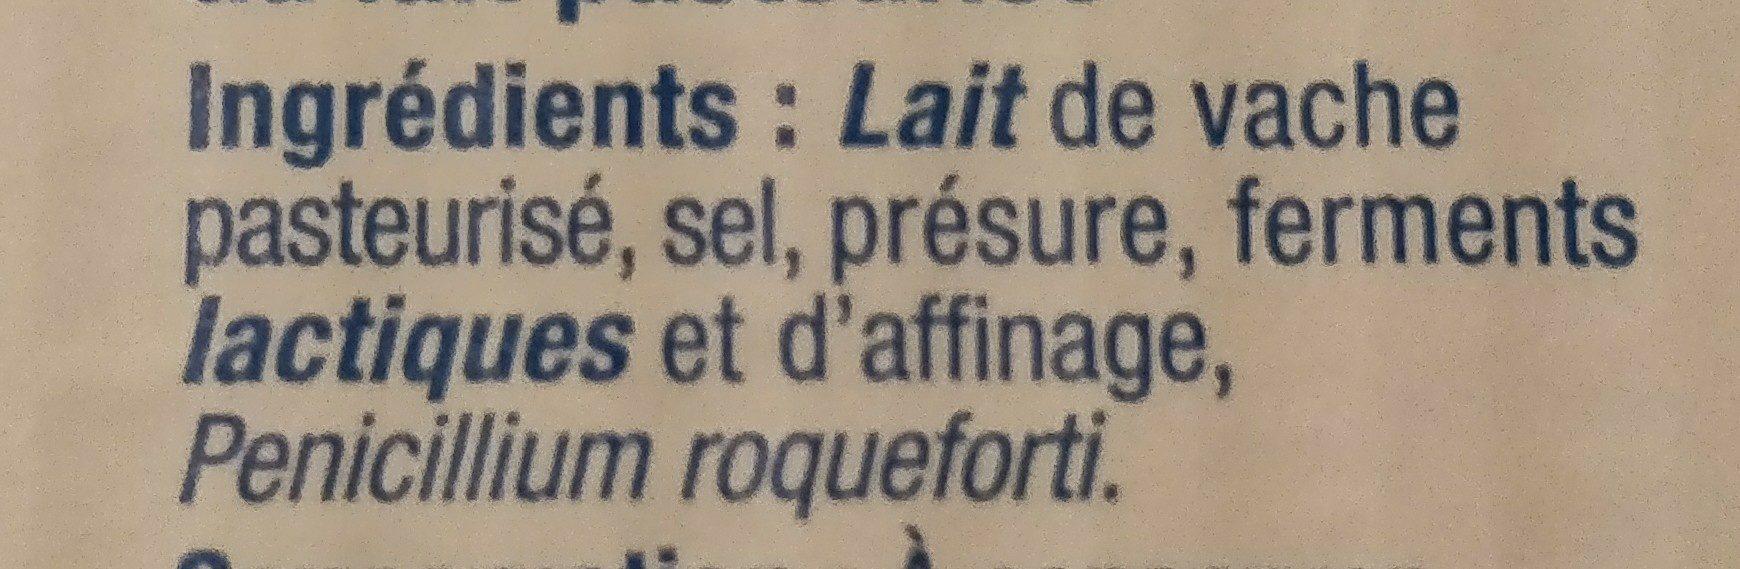 Bleu D'Auvergne 125G - Ingredients - fr